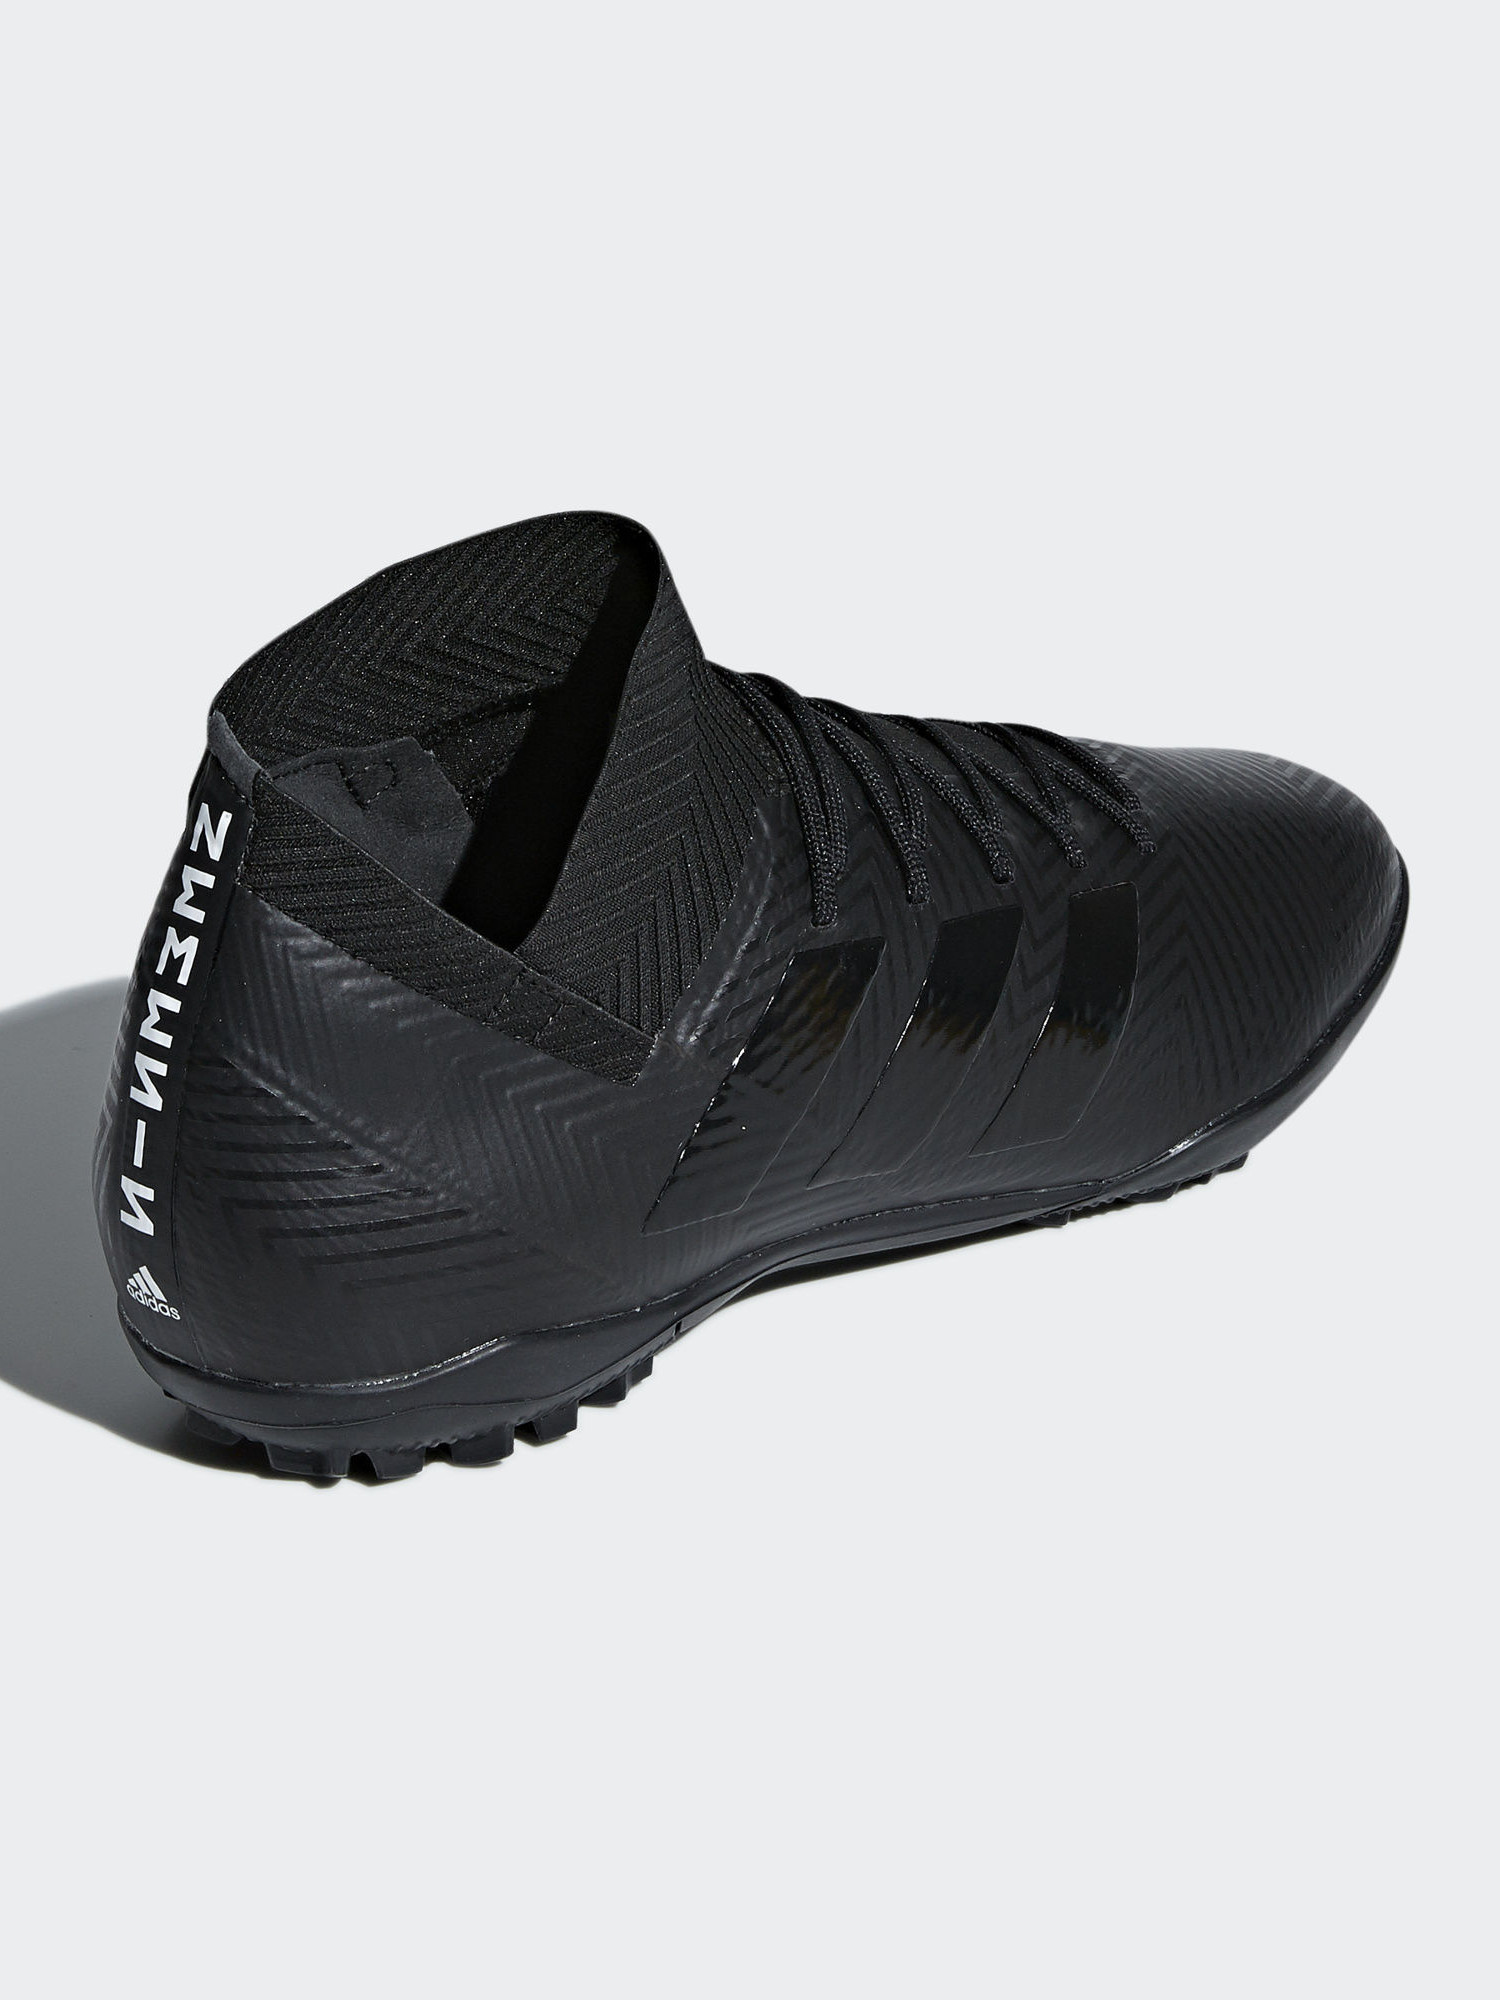 adidas trainer total black